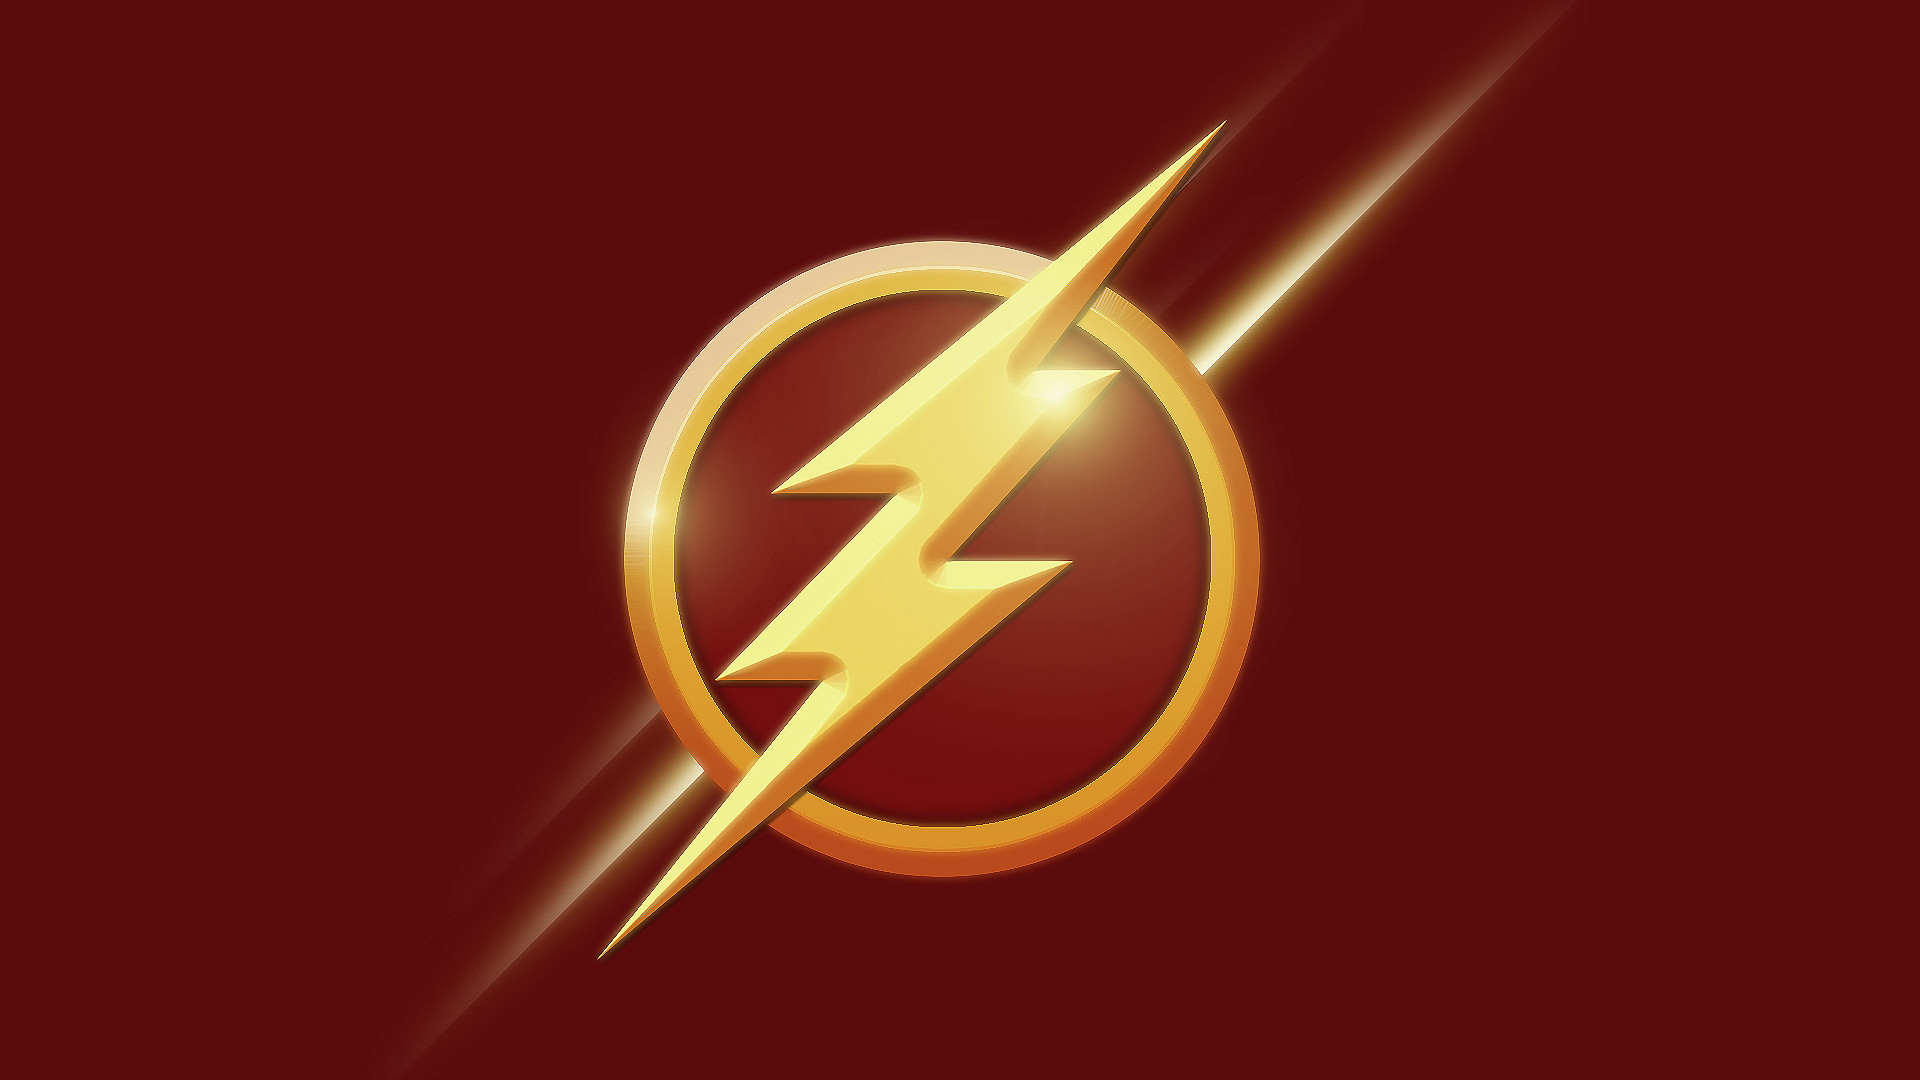 Flash Logo Hd The-flash-logo quantum multiverse Easy Designs To Draw For Kids